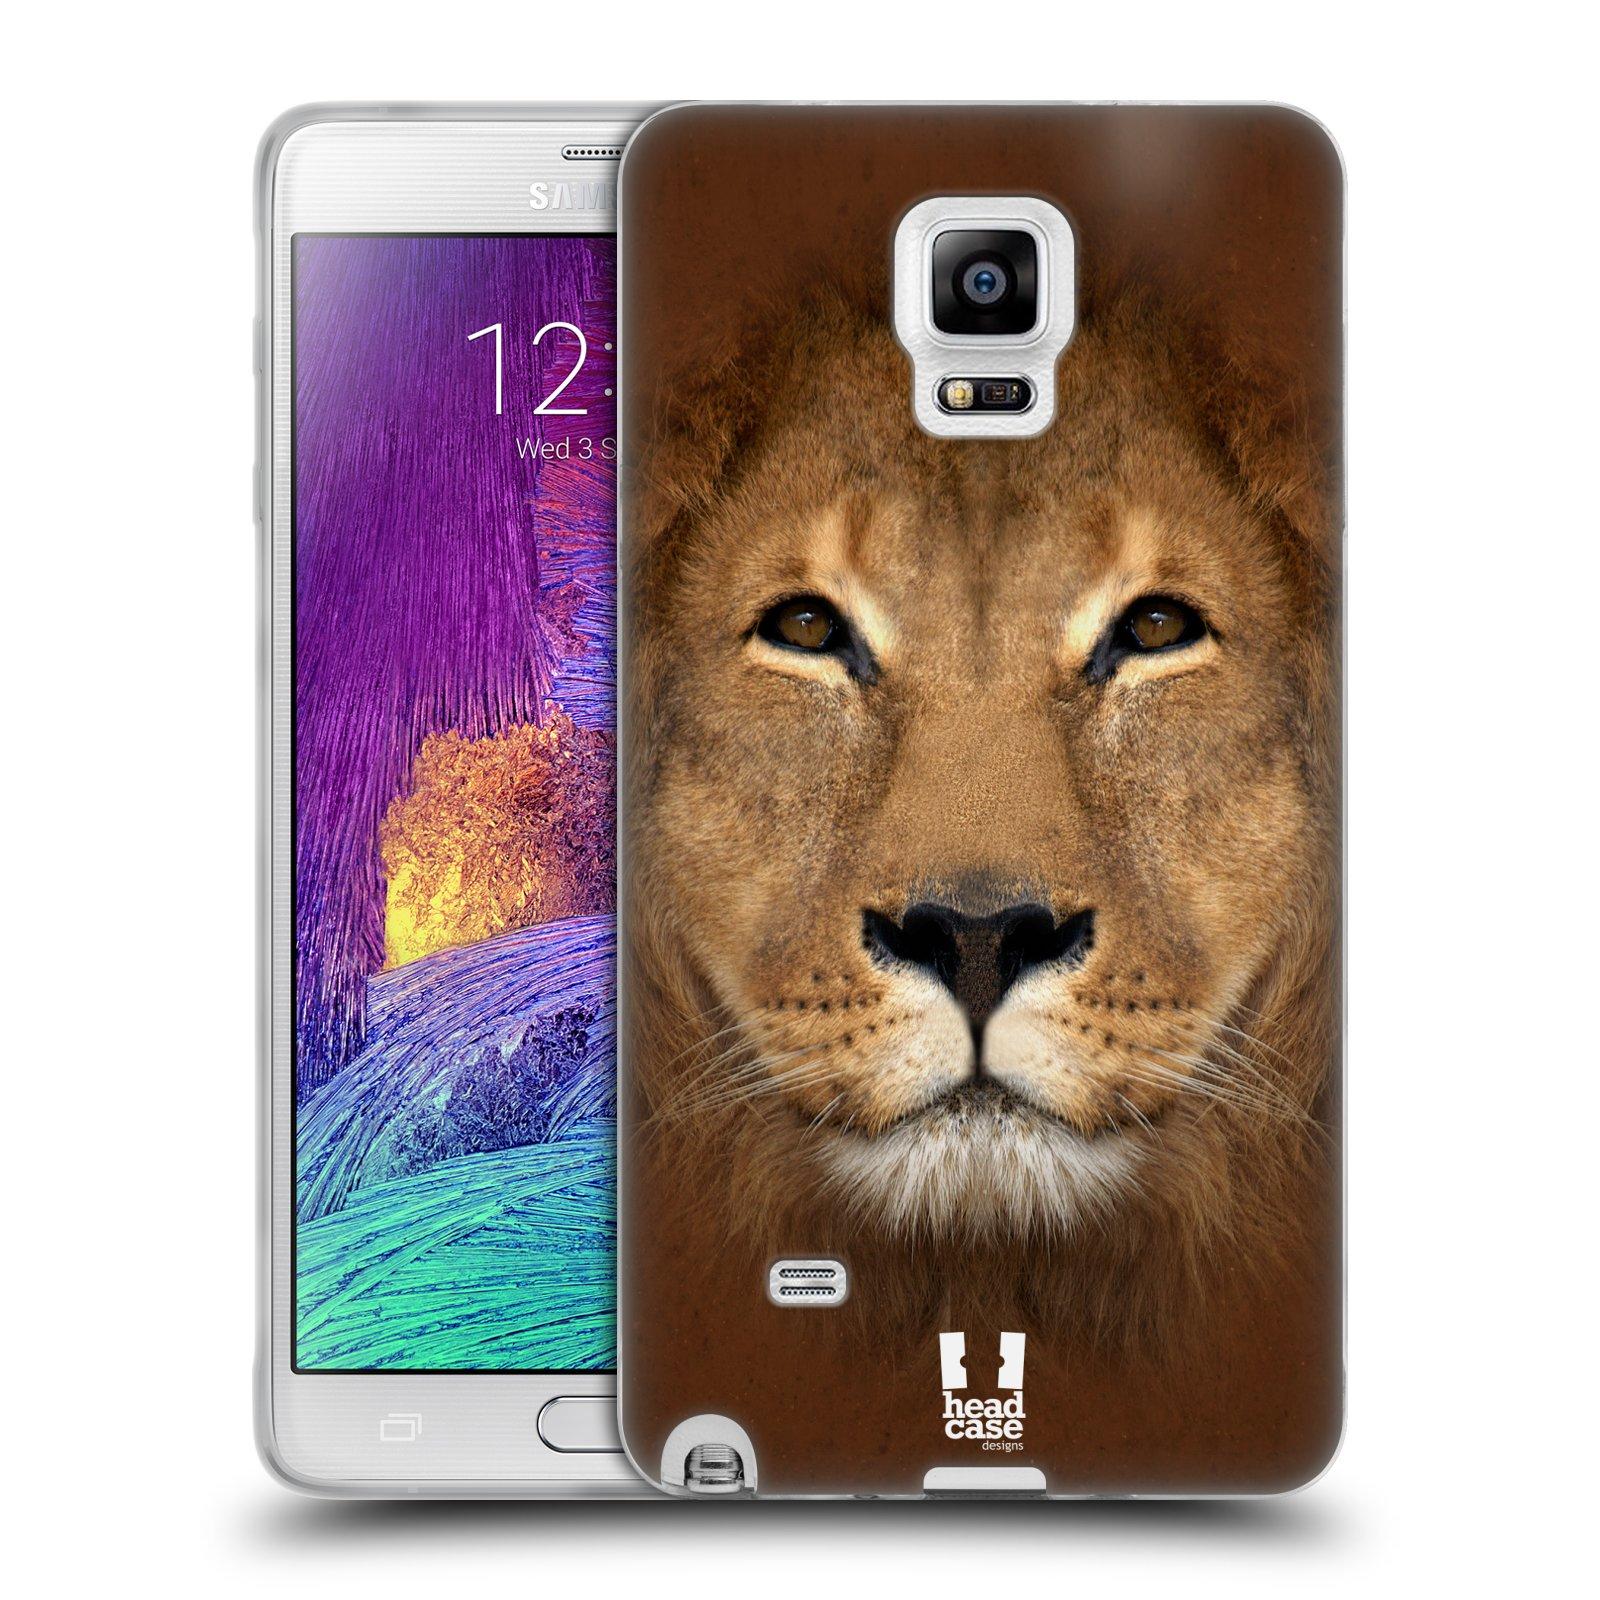 HEAD CASE silikonový obal na mobil Samsung Galaxy Note 4 (N910) vzor Zvířecí tváře 2 Lev